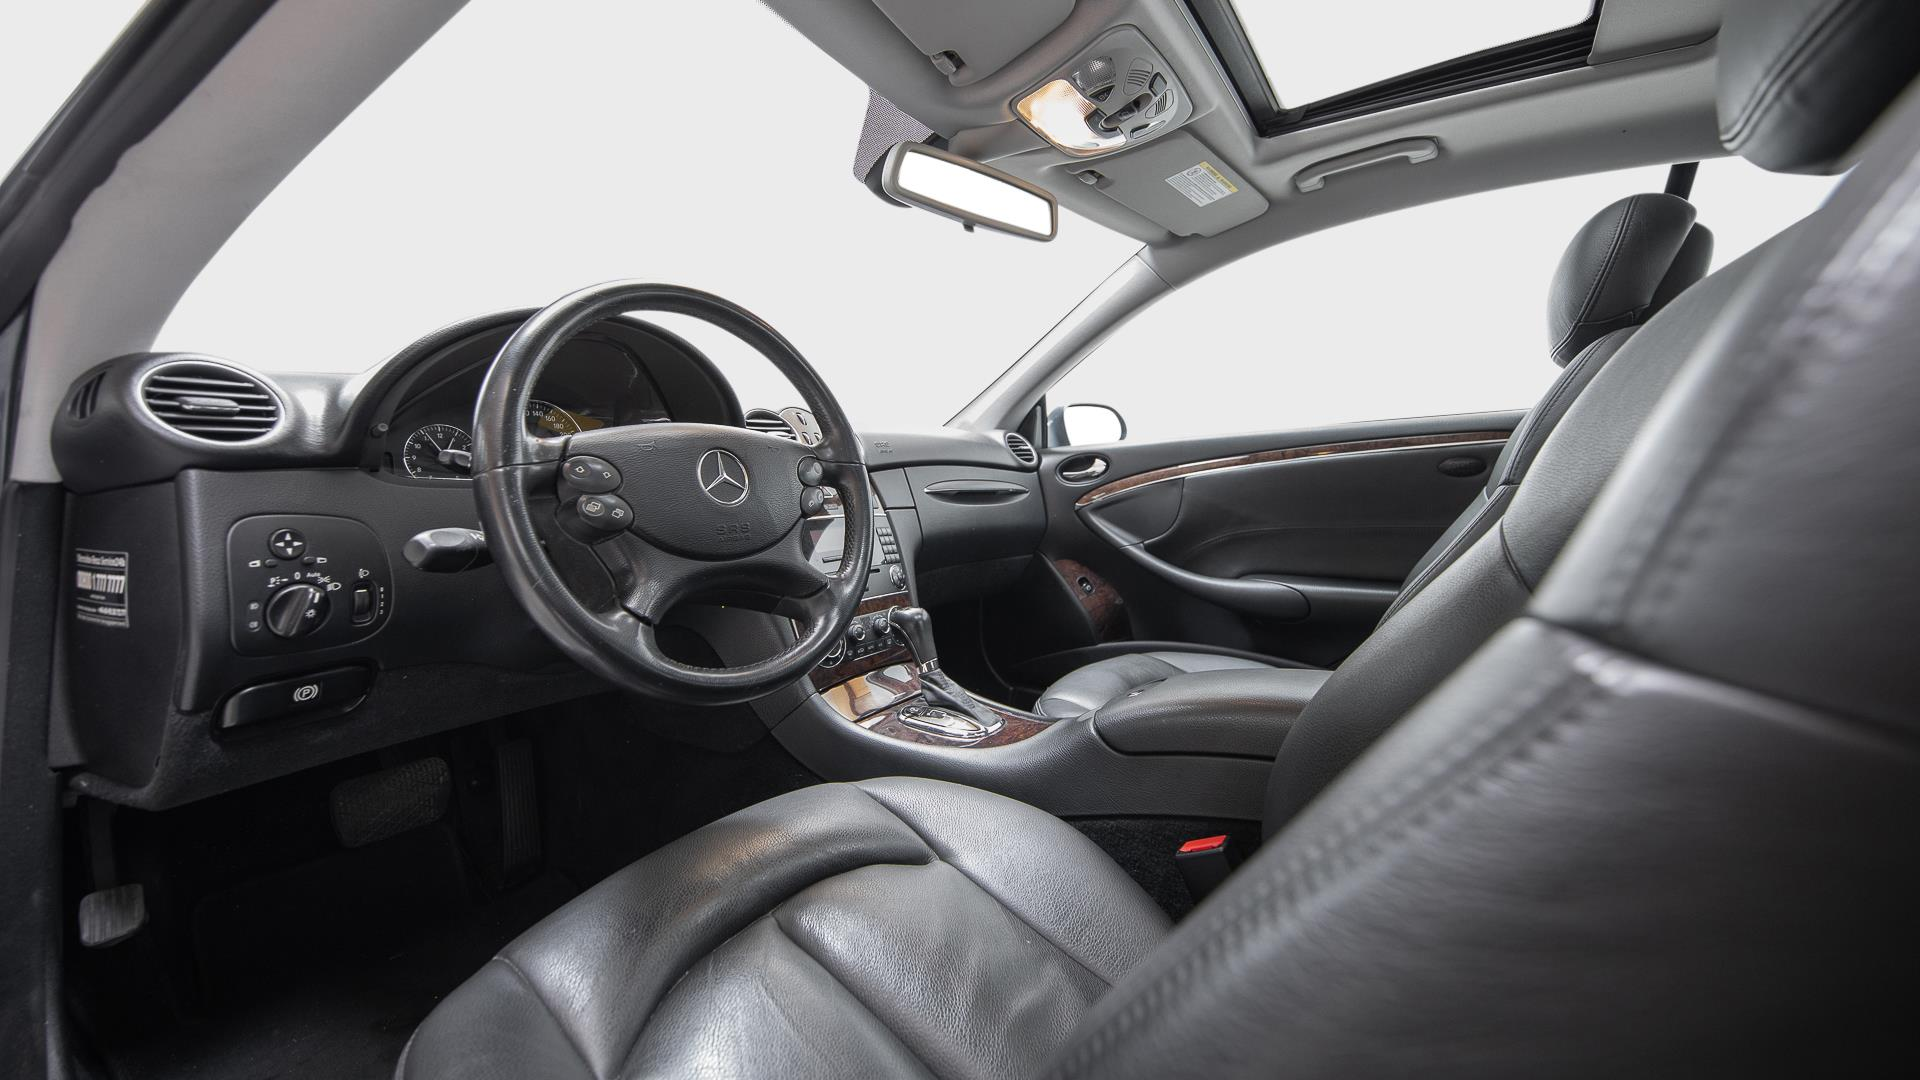 Billede af Mercedes-Benz CLK200 Kompressor aut. 163HK 2d